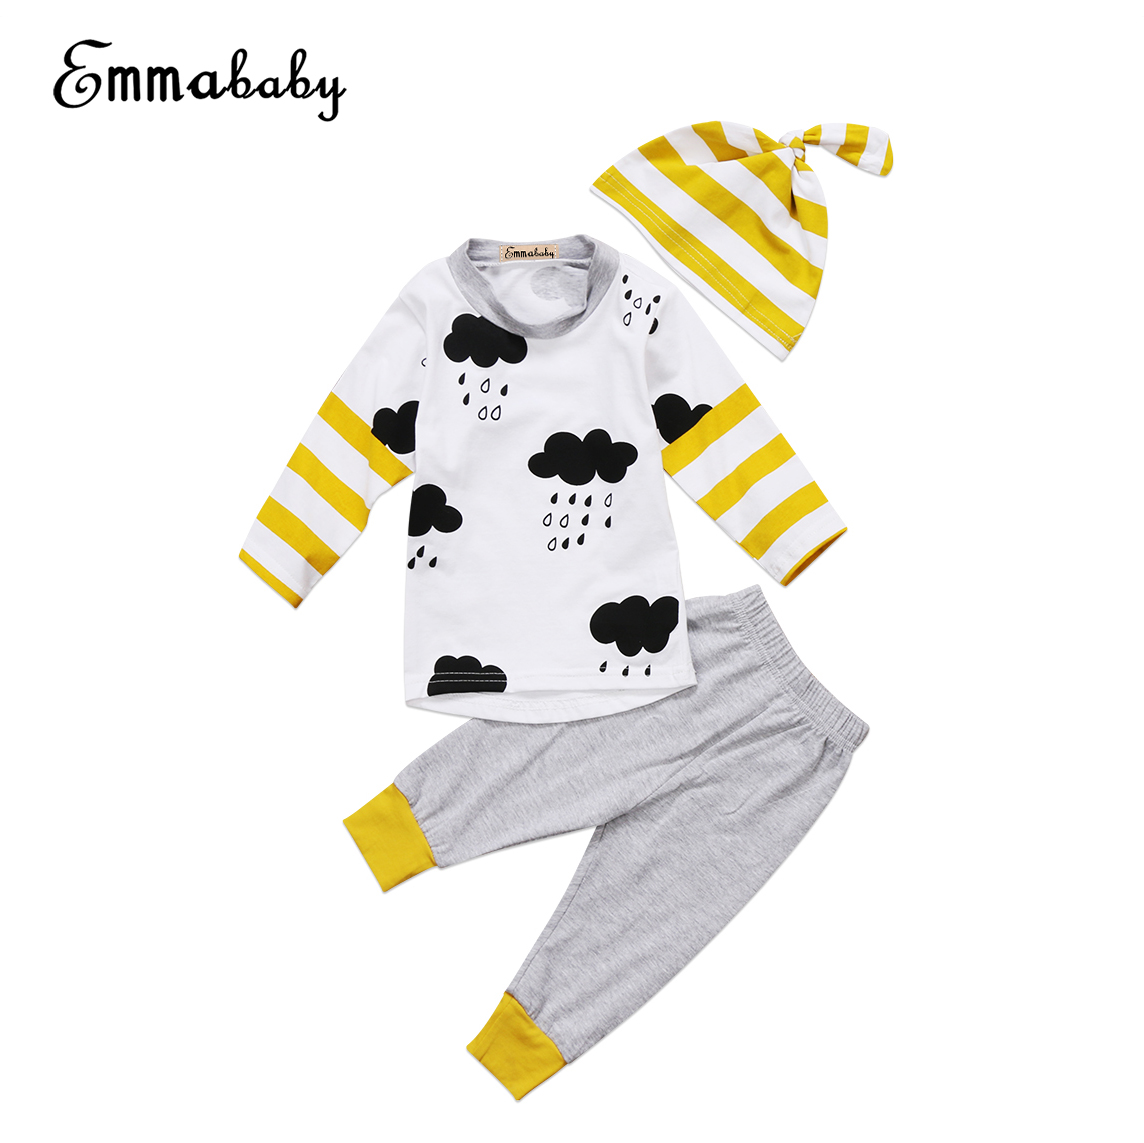 3PCS Newborn Kids Baby Boys Girls Outfit Clothes T-shirt Tops+Long Pants+Hat Set